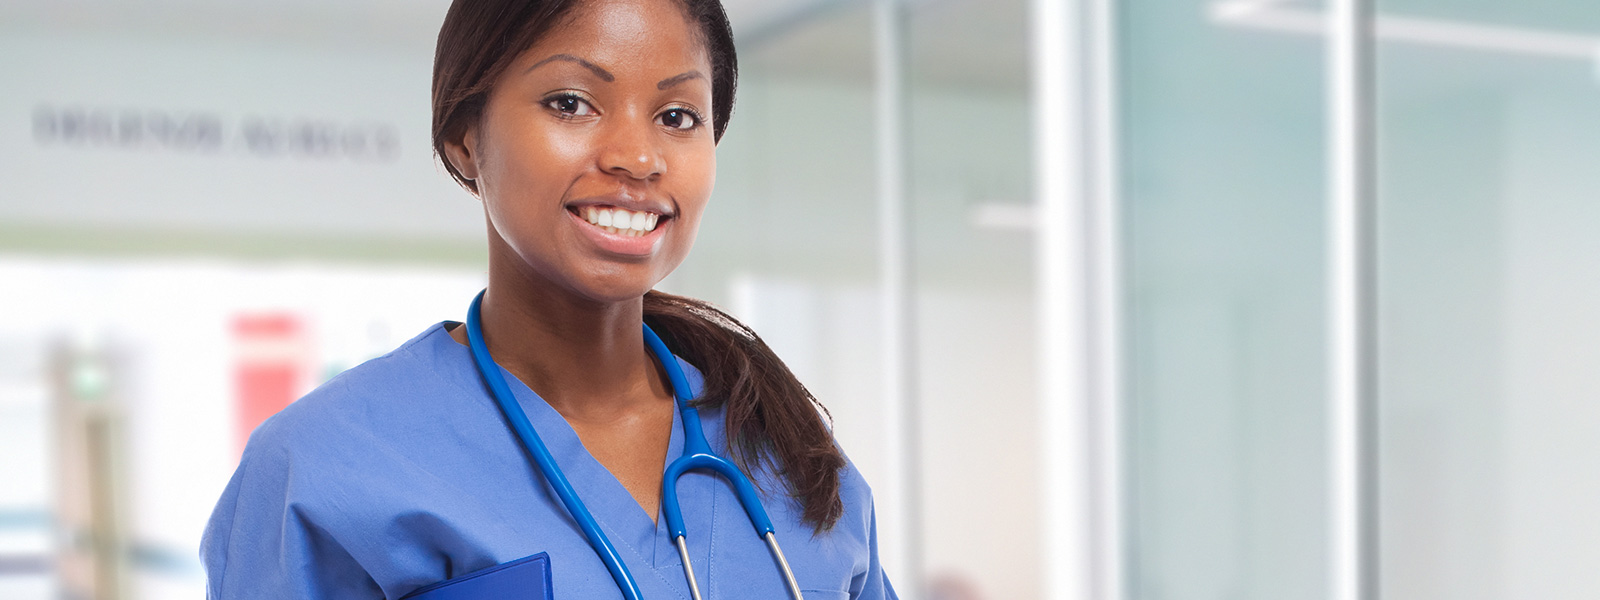 Defense lawyers for nurses